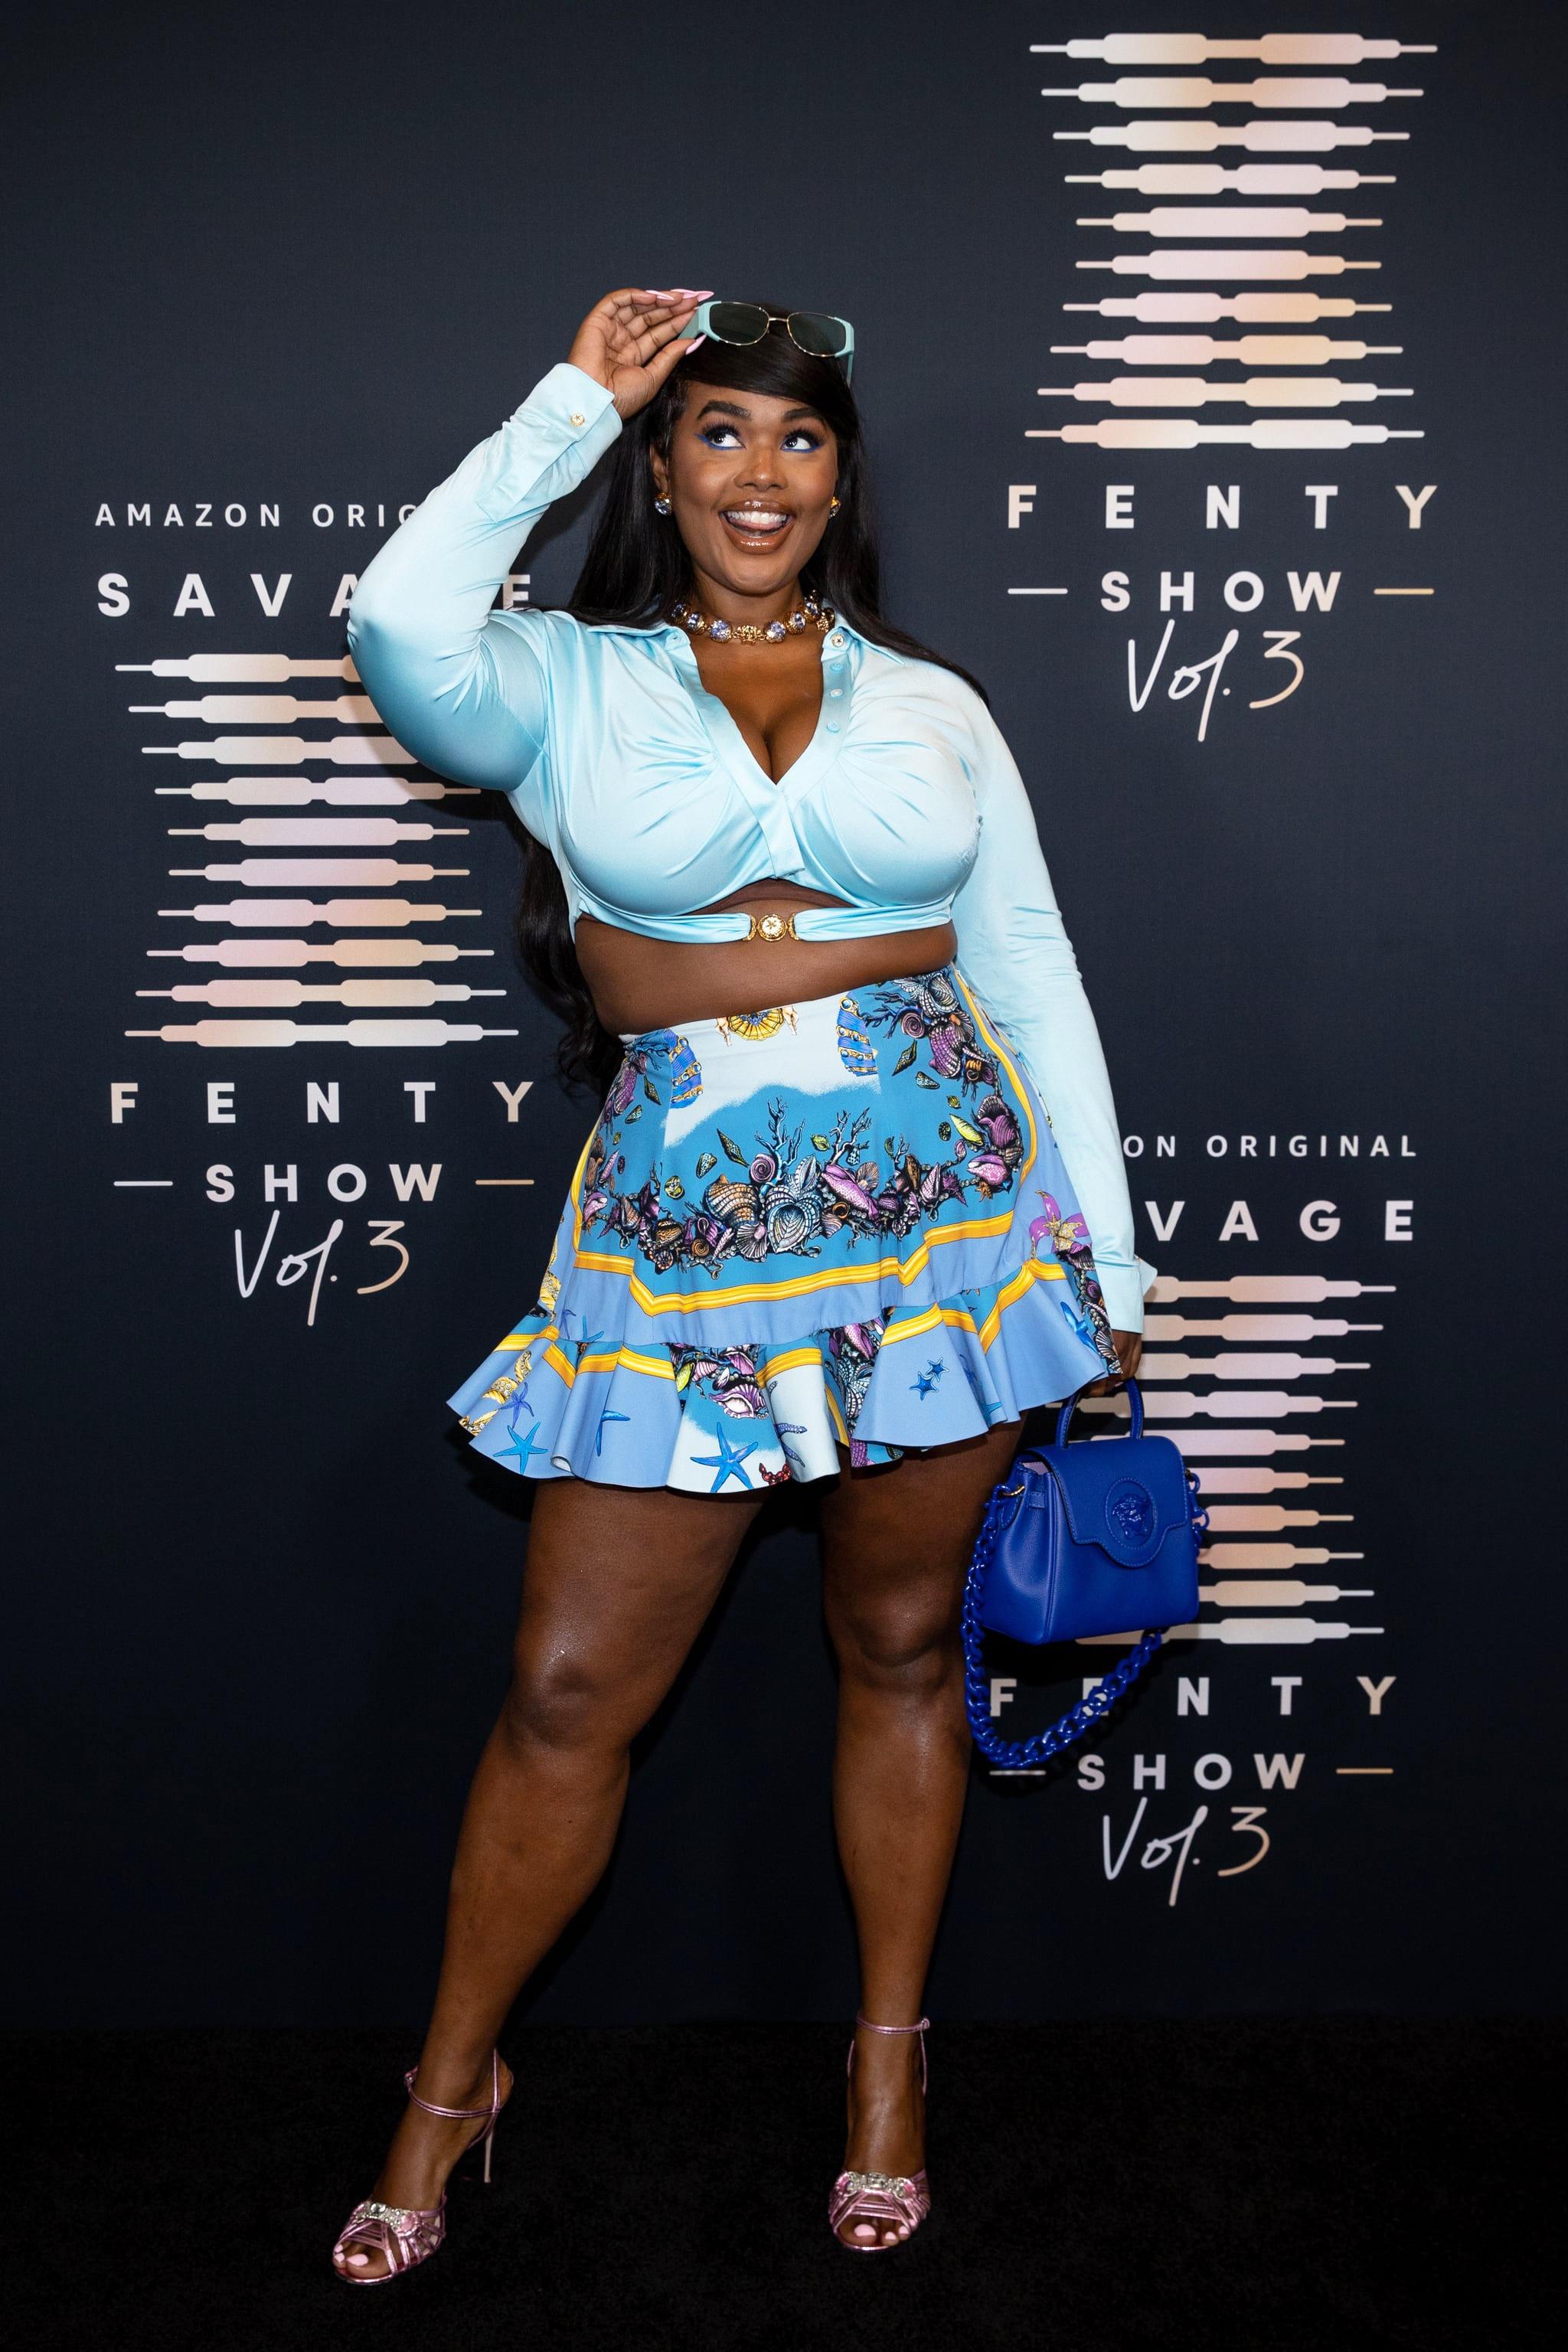 Nguoi mau tham du show Rihanna anh 8